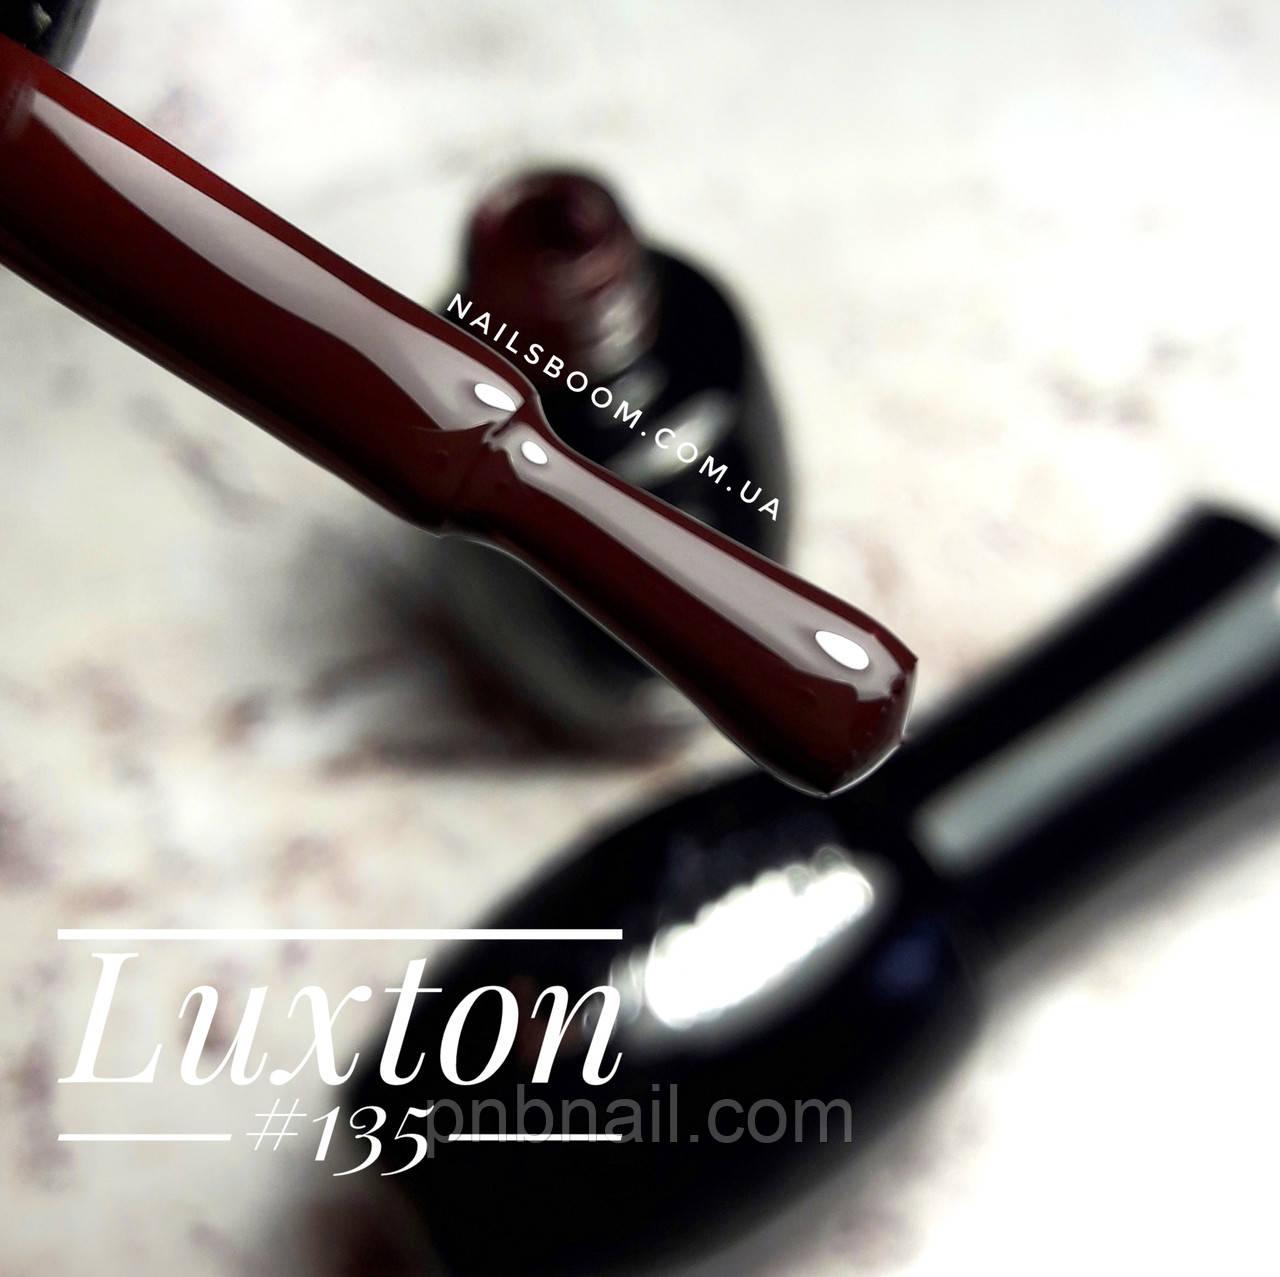 LUXTON premium № 135, 10 мл